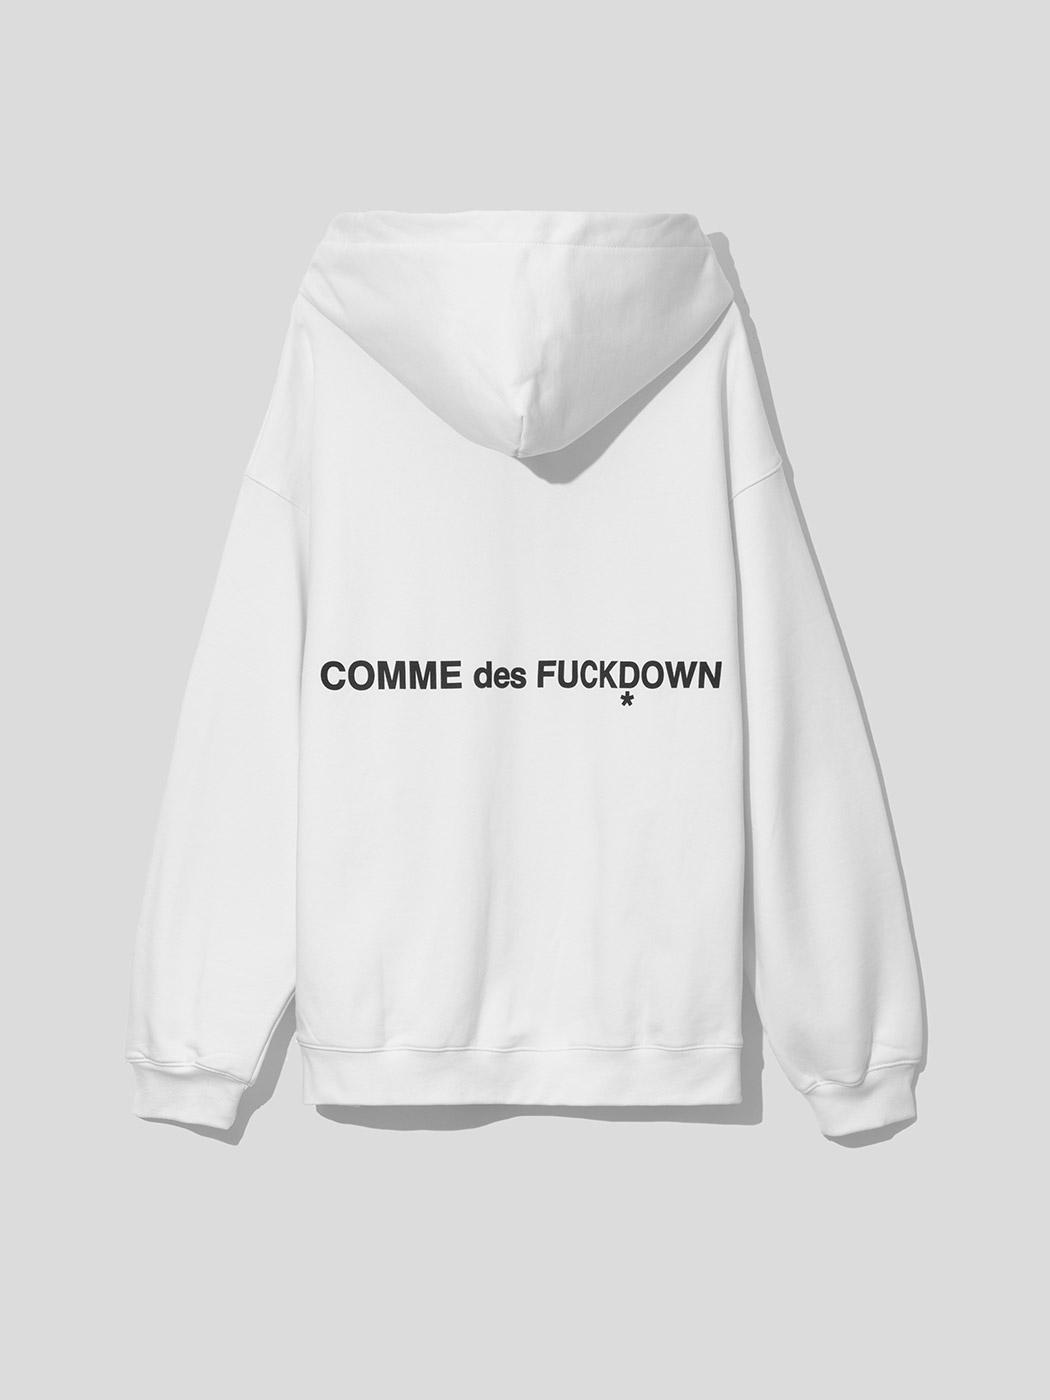 SWEATSHIRT - CDFU1241 - COMME DES FKDOWN